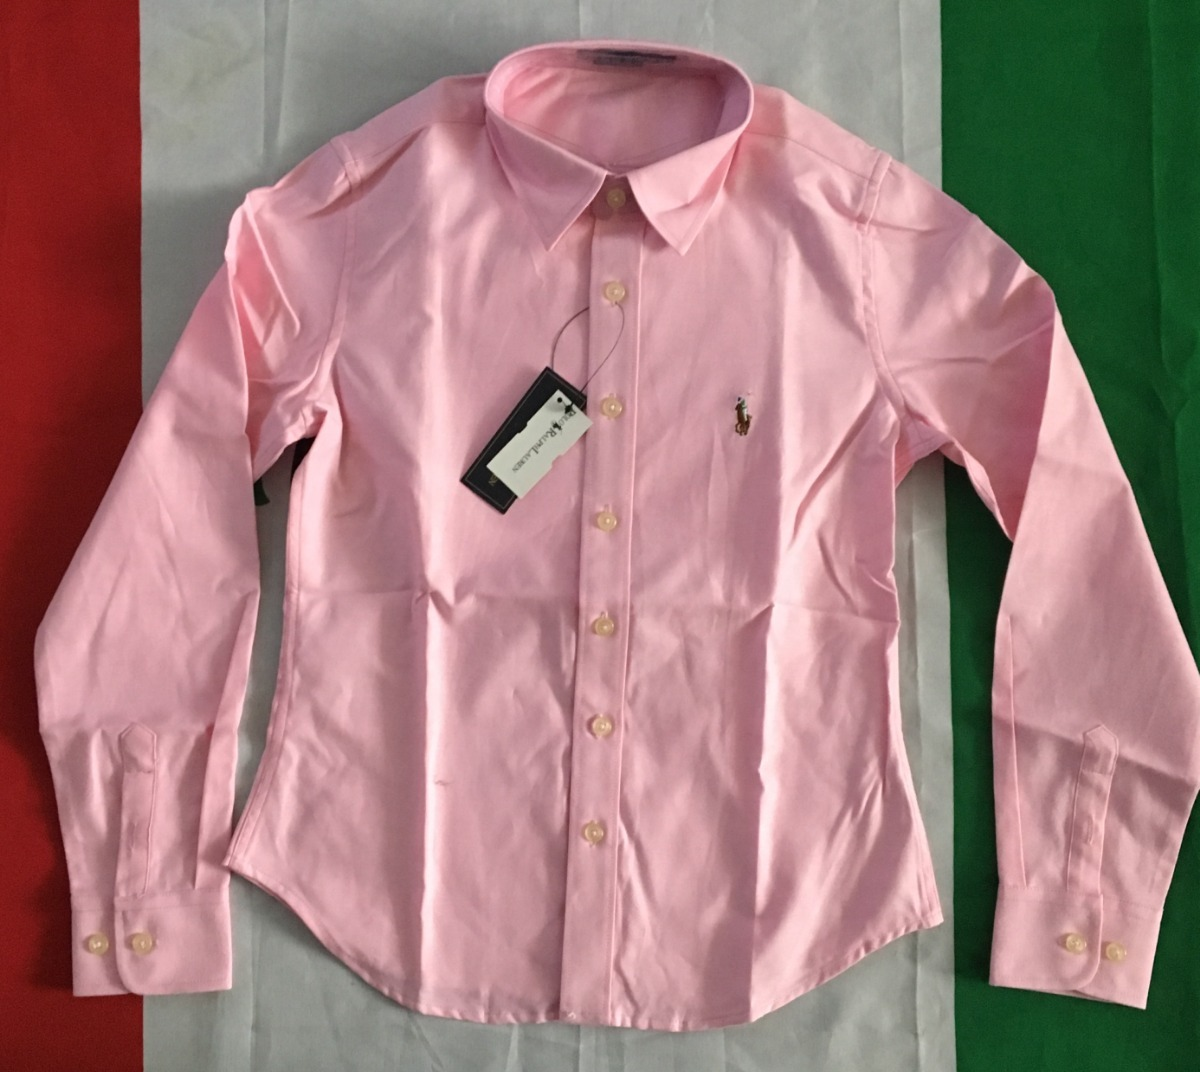 increible blusa camisa rosa mujer dama polo ralph lauren. Cargando zoom. f993ba35a48